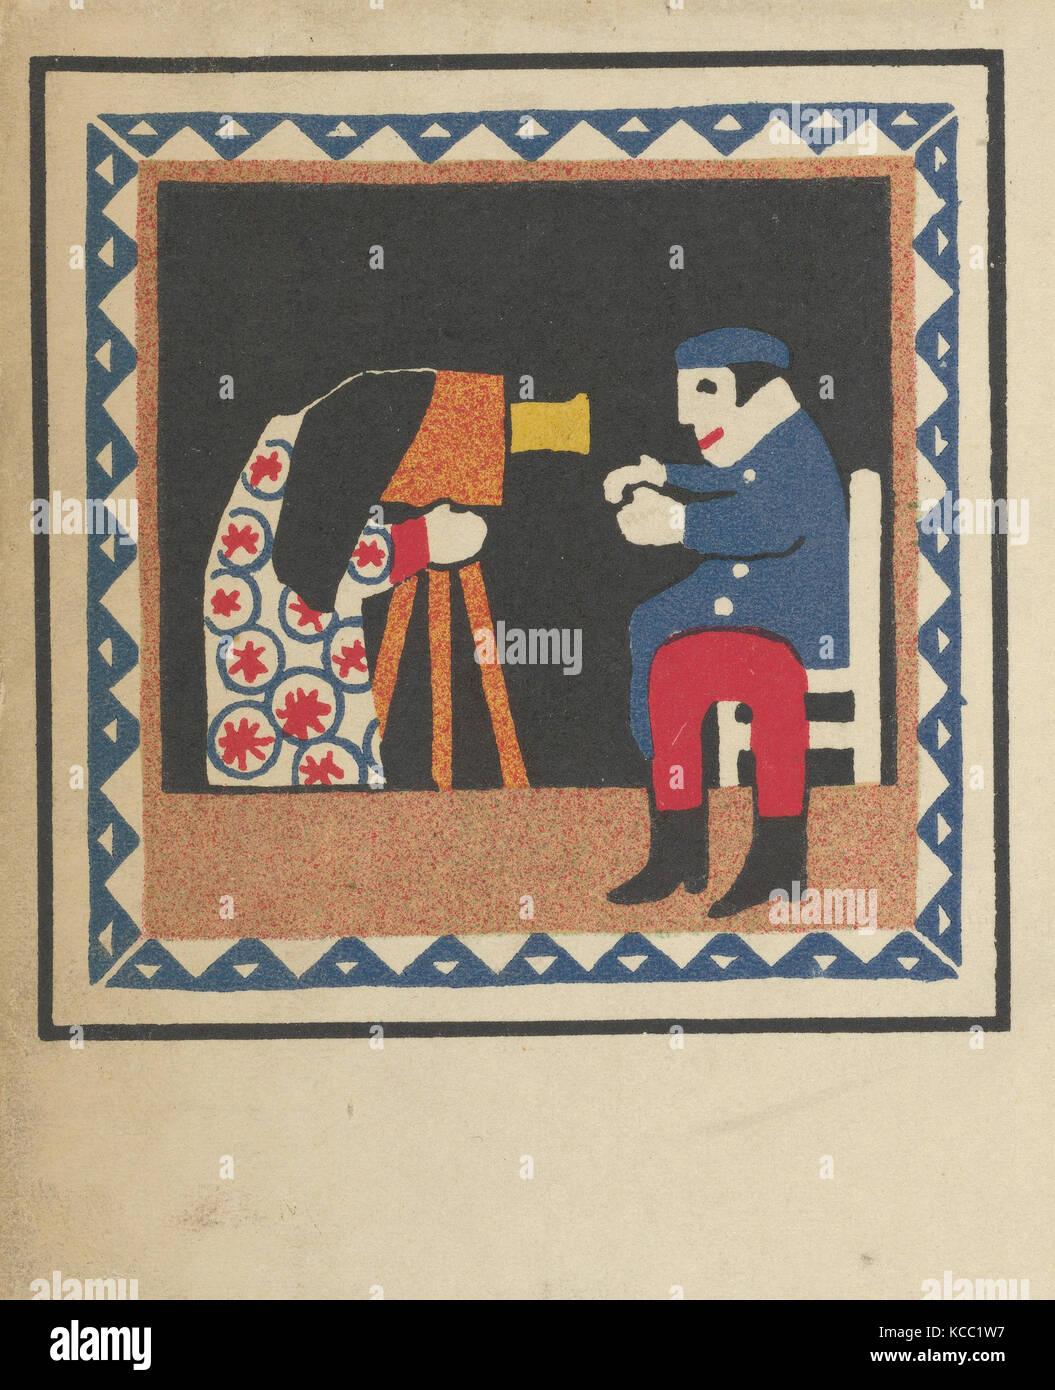 Kasperltheater, 1907, Color lithograph, sheet: 5 9/16 x 3 7/16 in. (14.1 x 8.7 cm), Prints, Hans Kalmsteiner (Austrian, - Stock Image